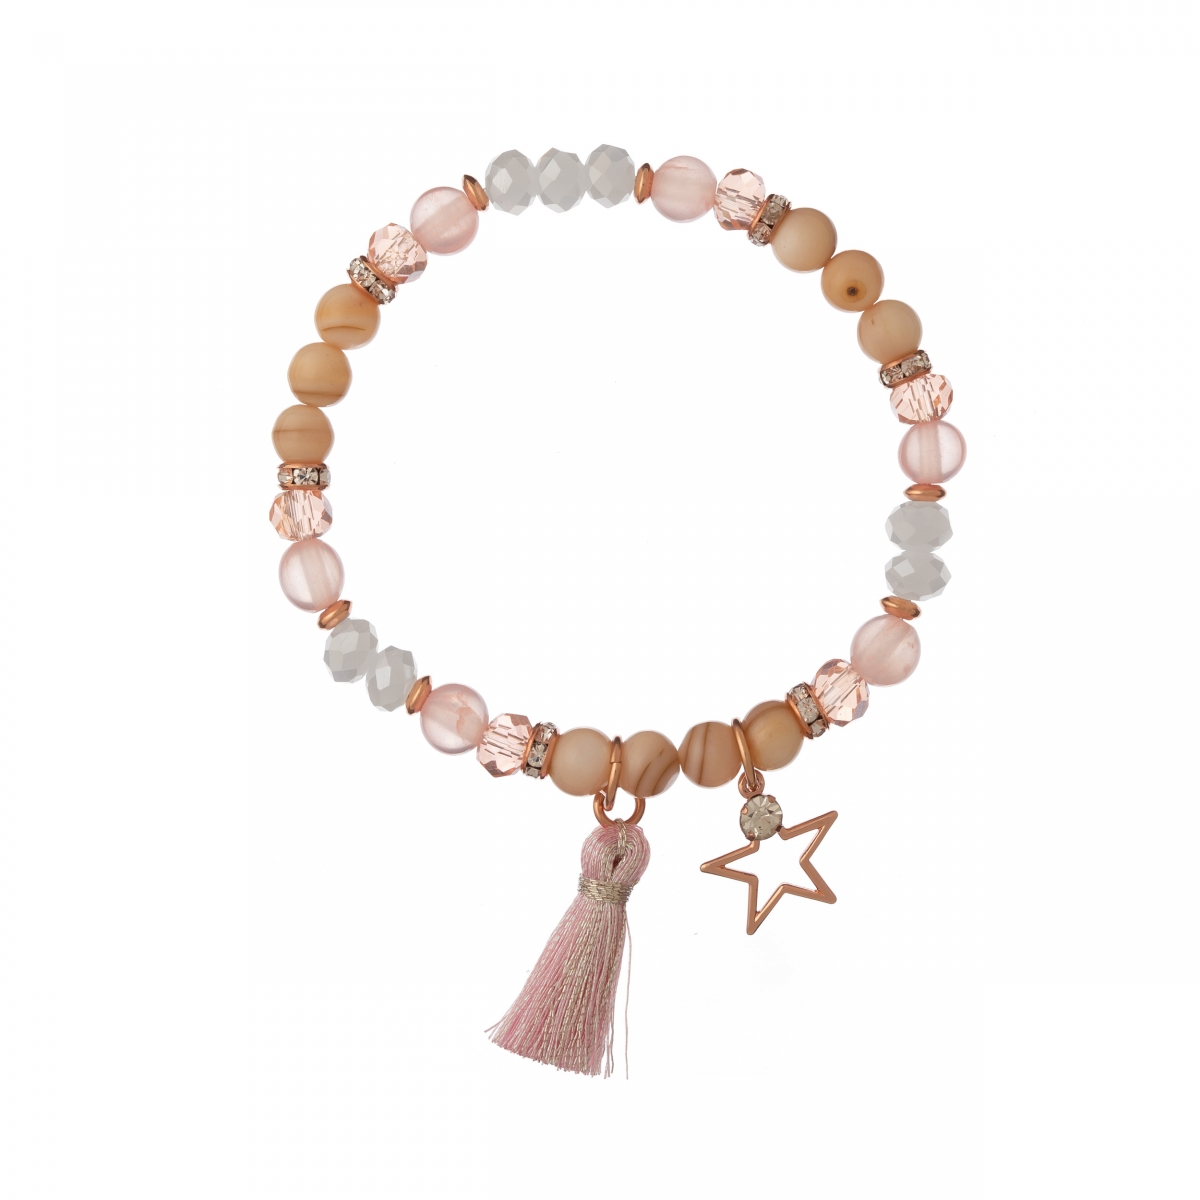 Náramok MIneral Pink Crystal & Shell Rose Gold Star Textil Stripe